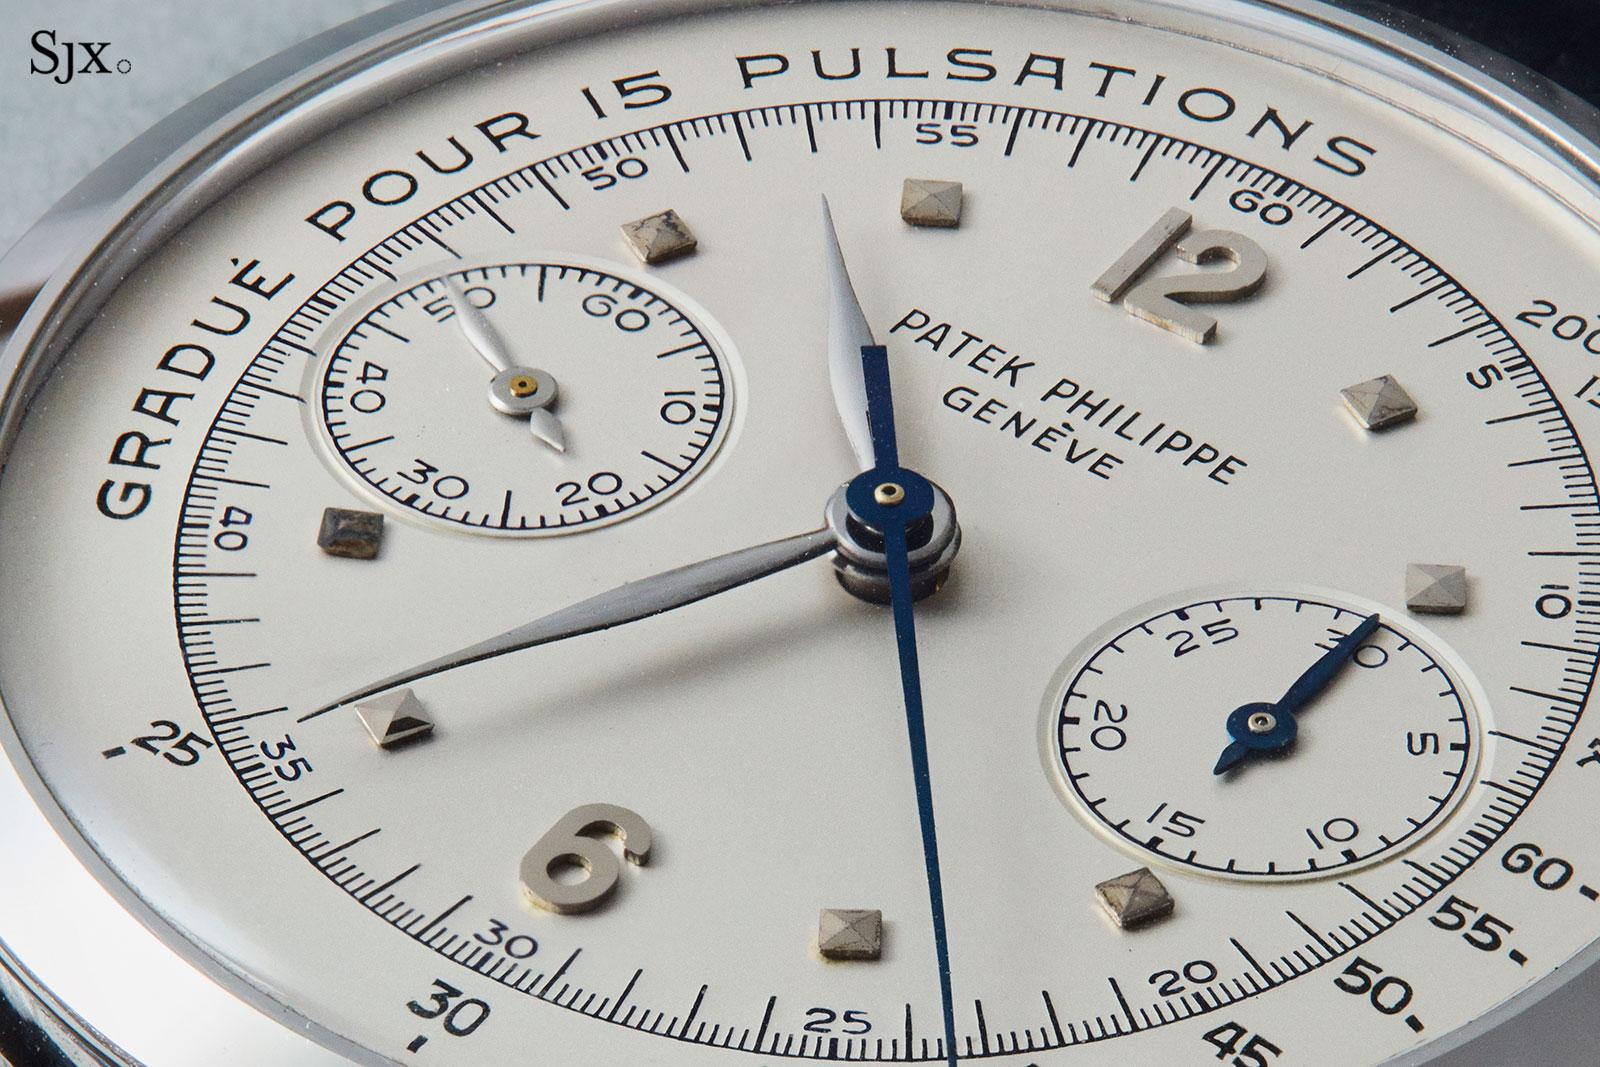 Patek Philippe 1579 steel pulsations dial 3